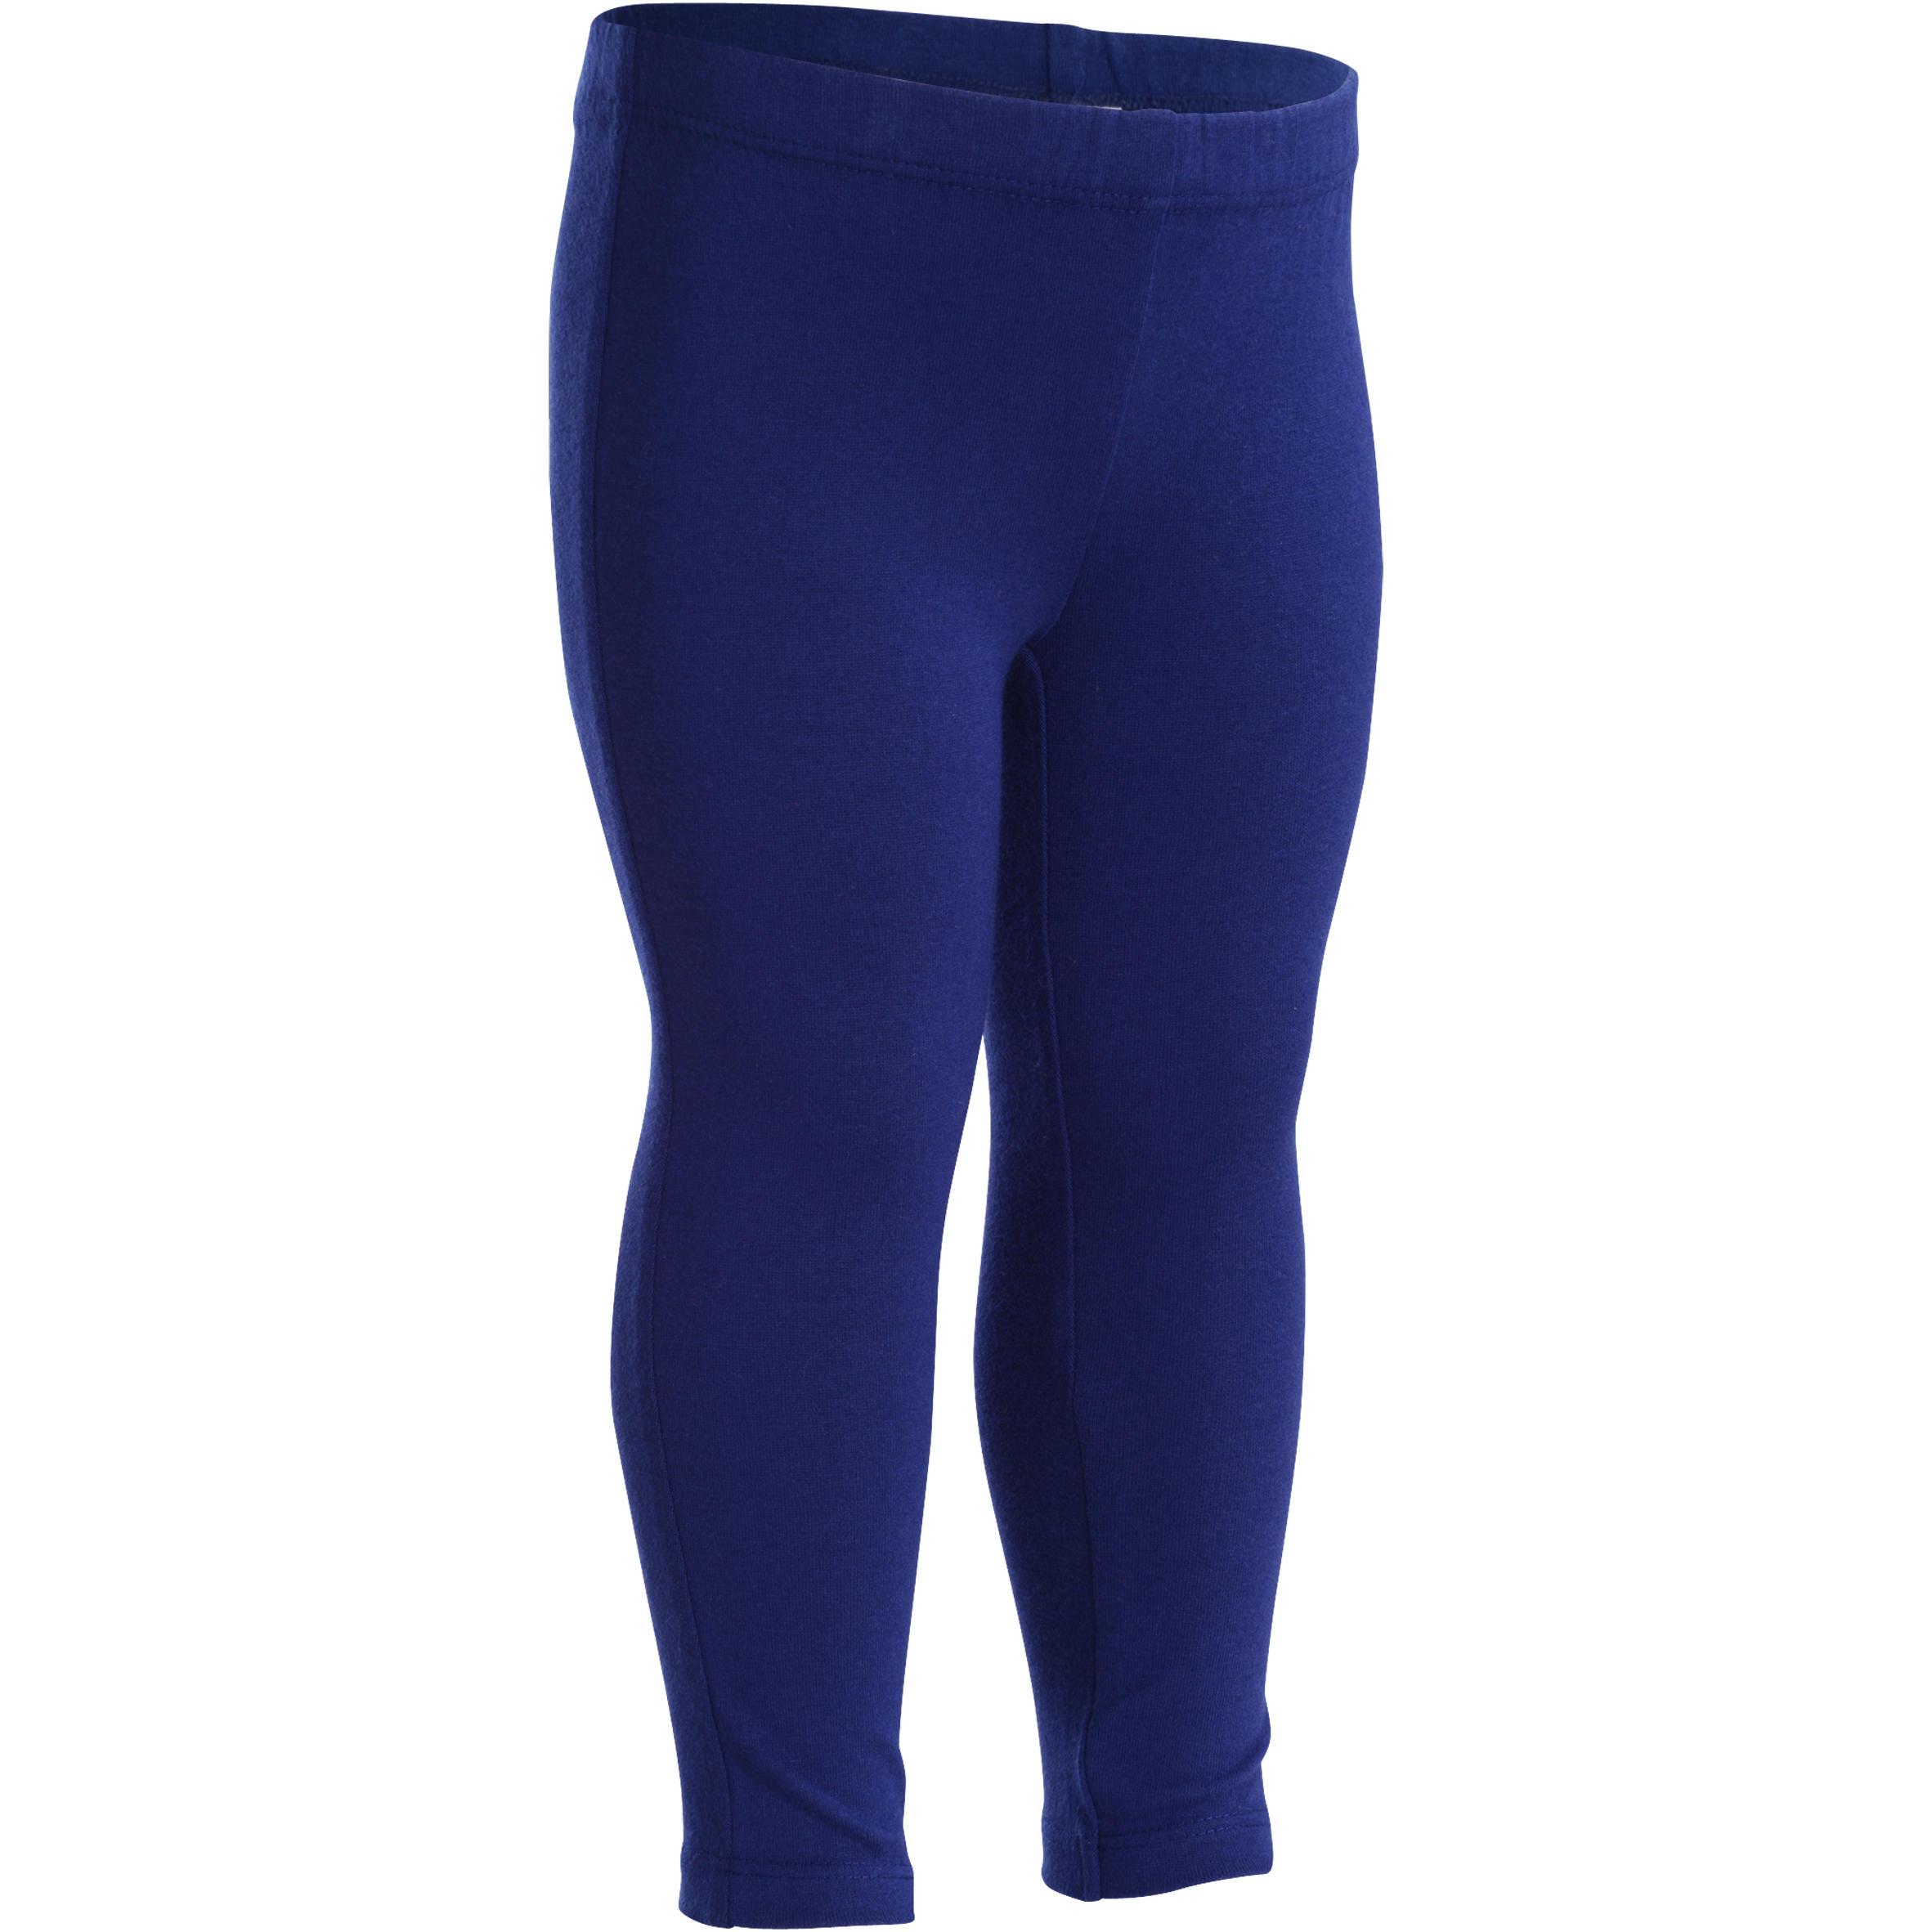 Set van 2 gym leggings voor peuters marineblauw